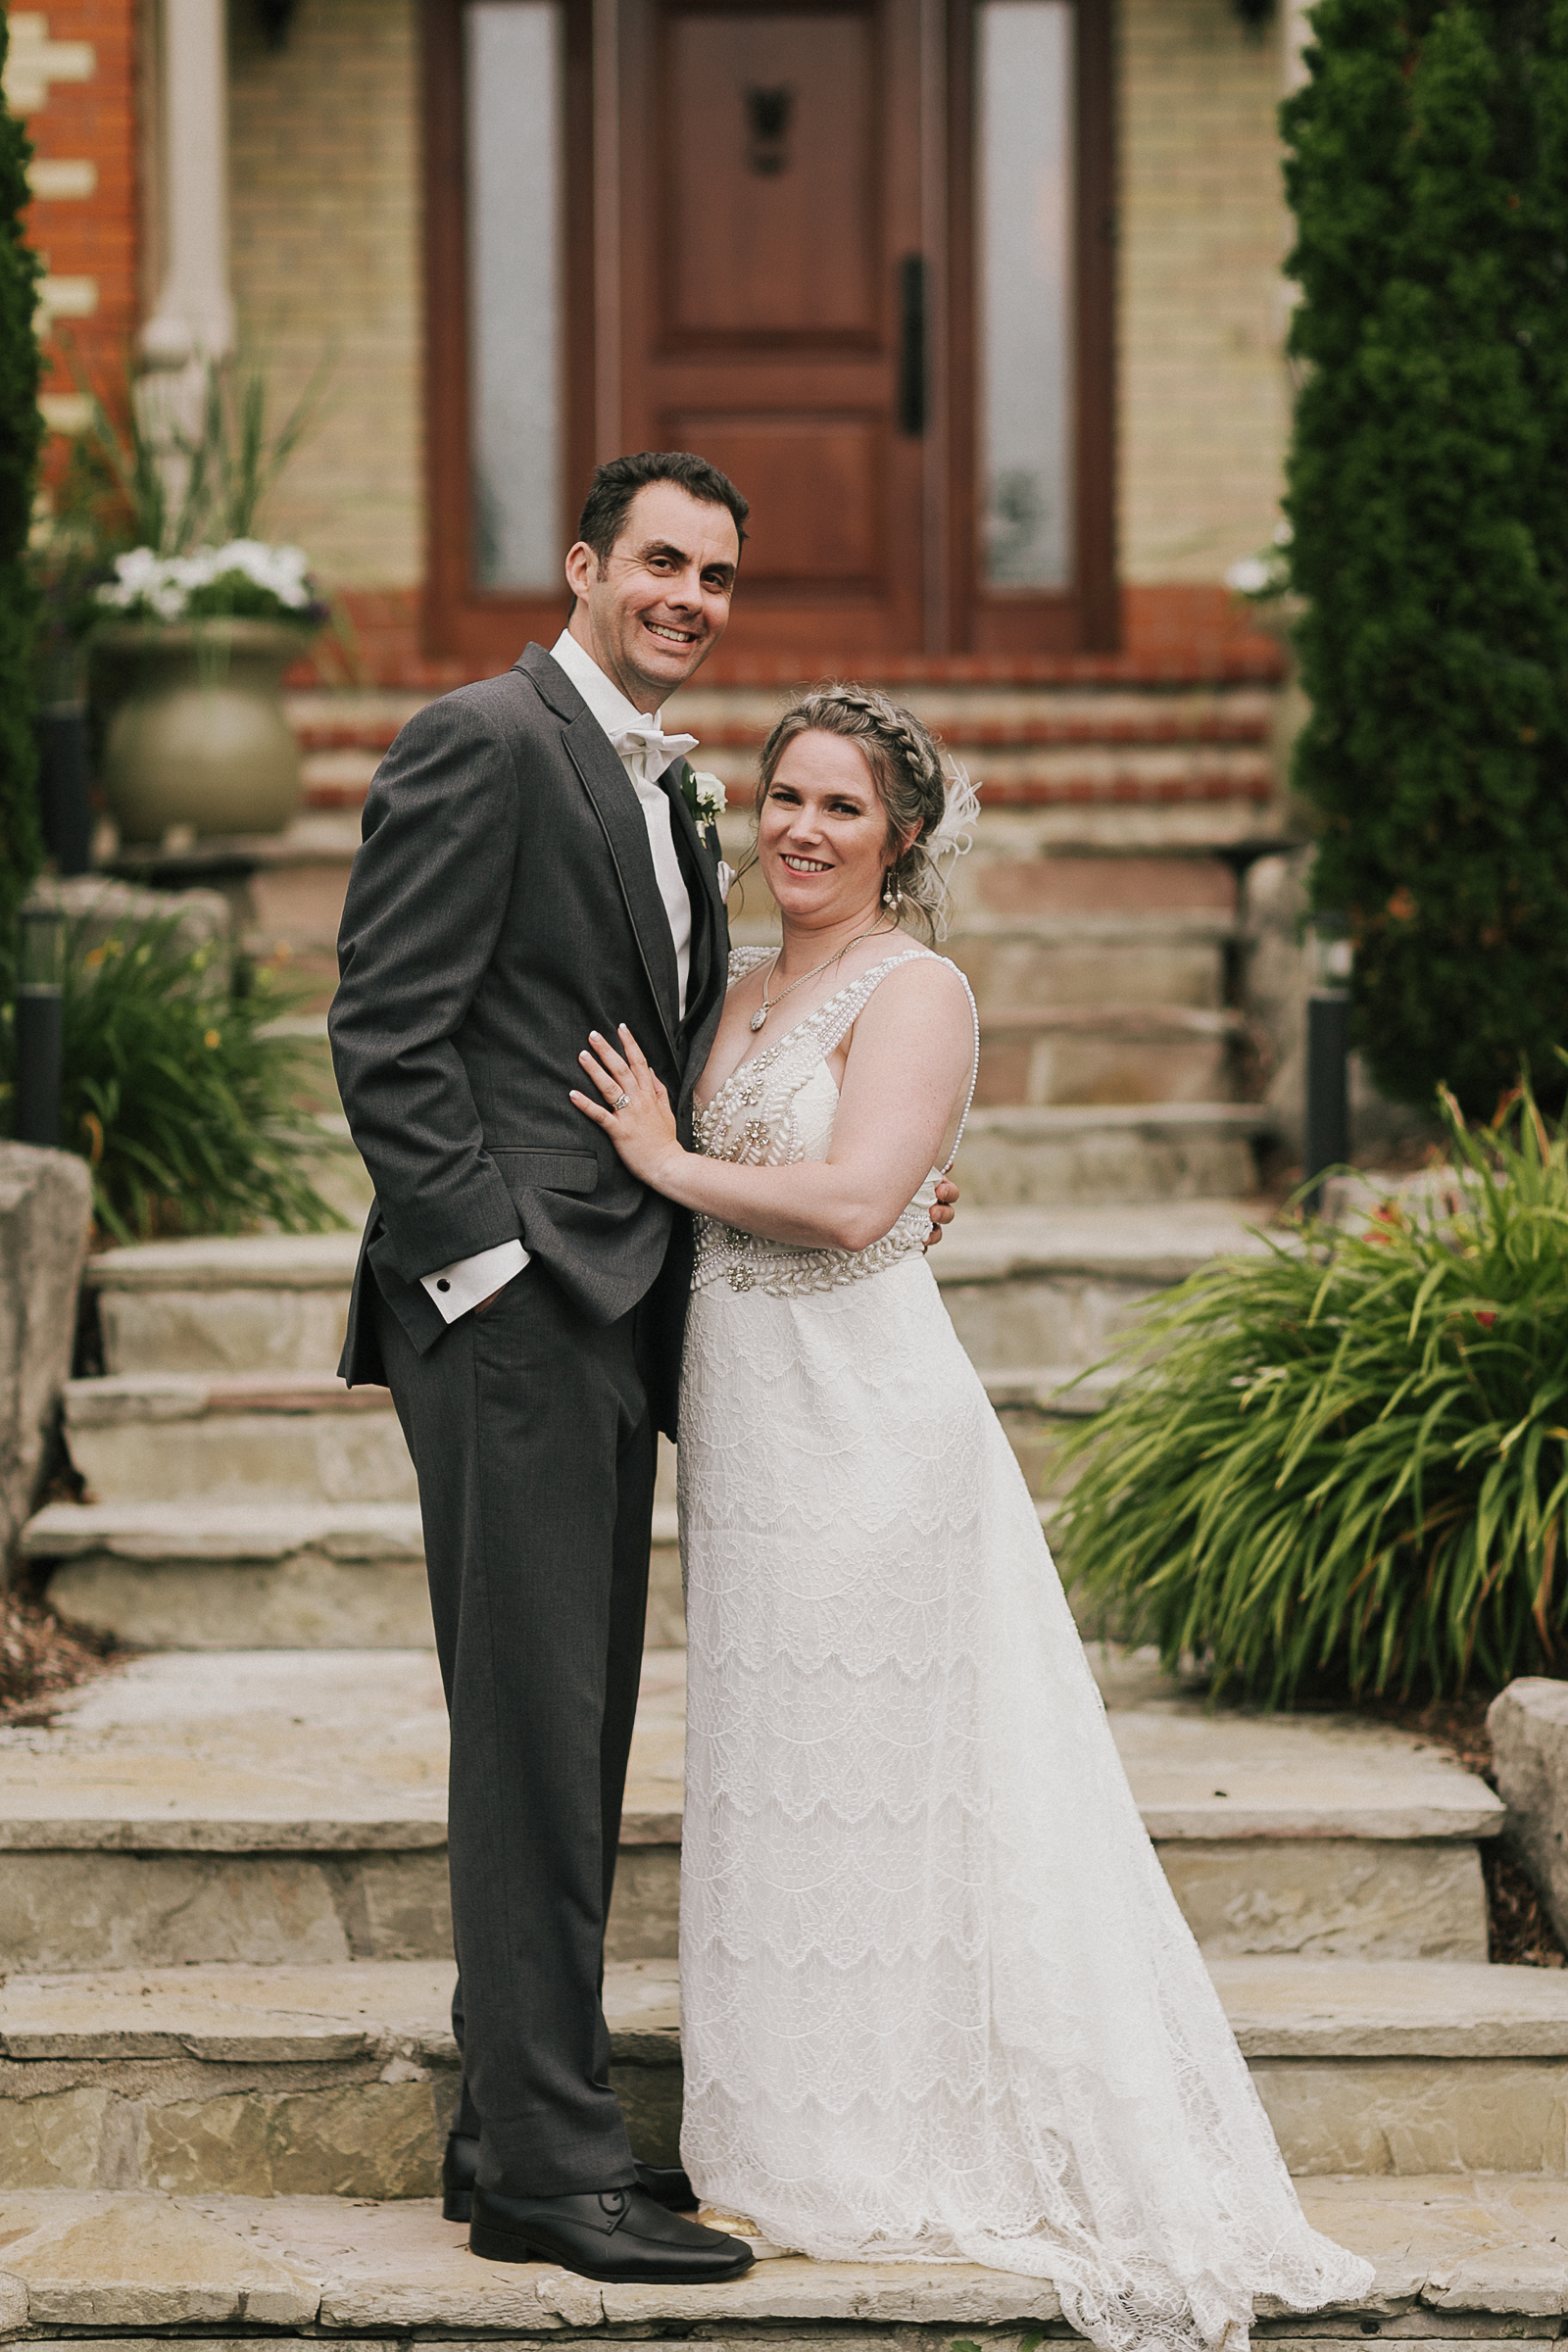 mike-and-jenni-wedding-498.jpg